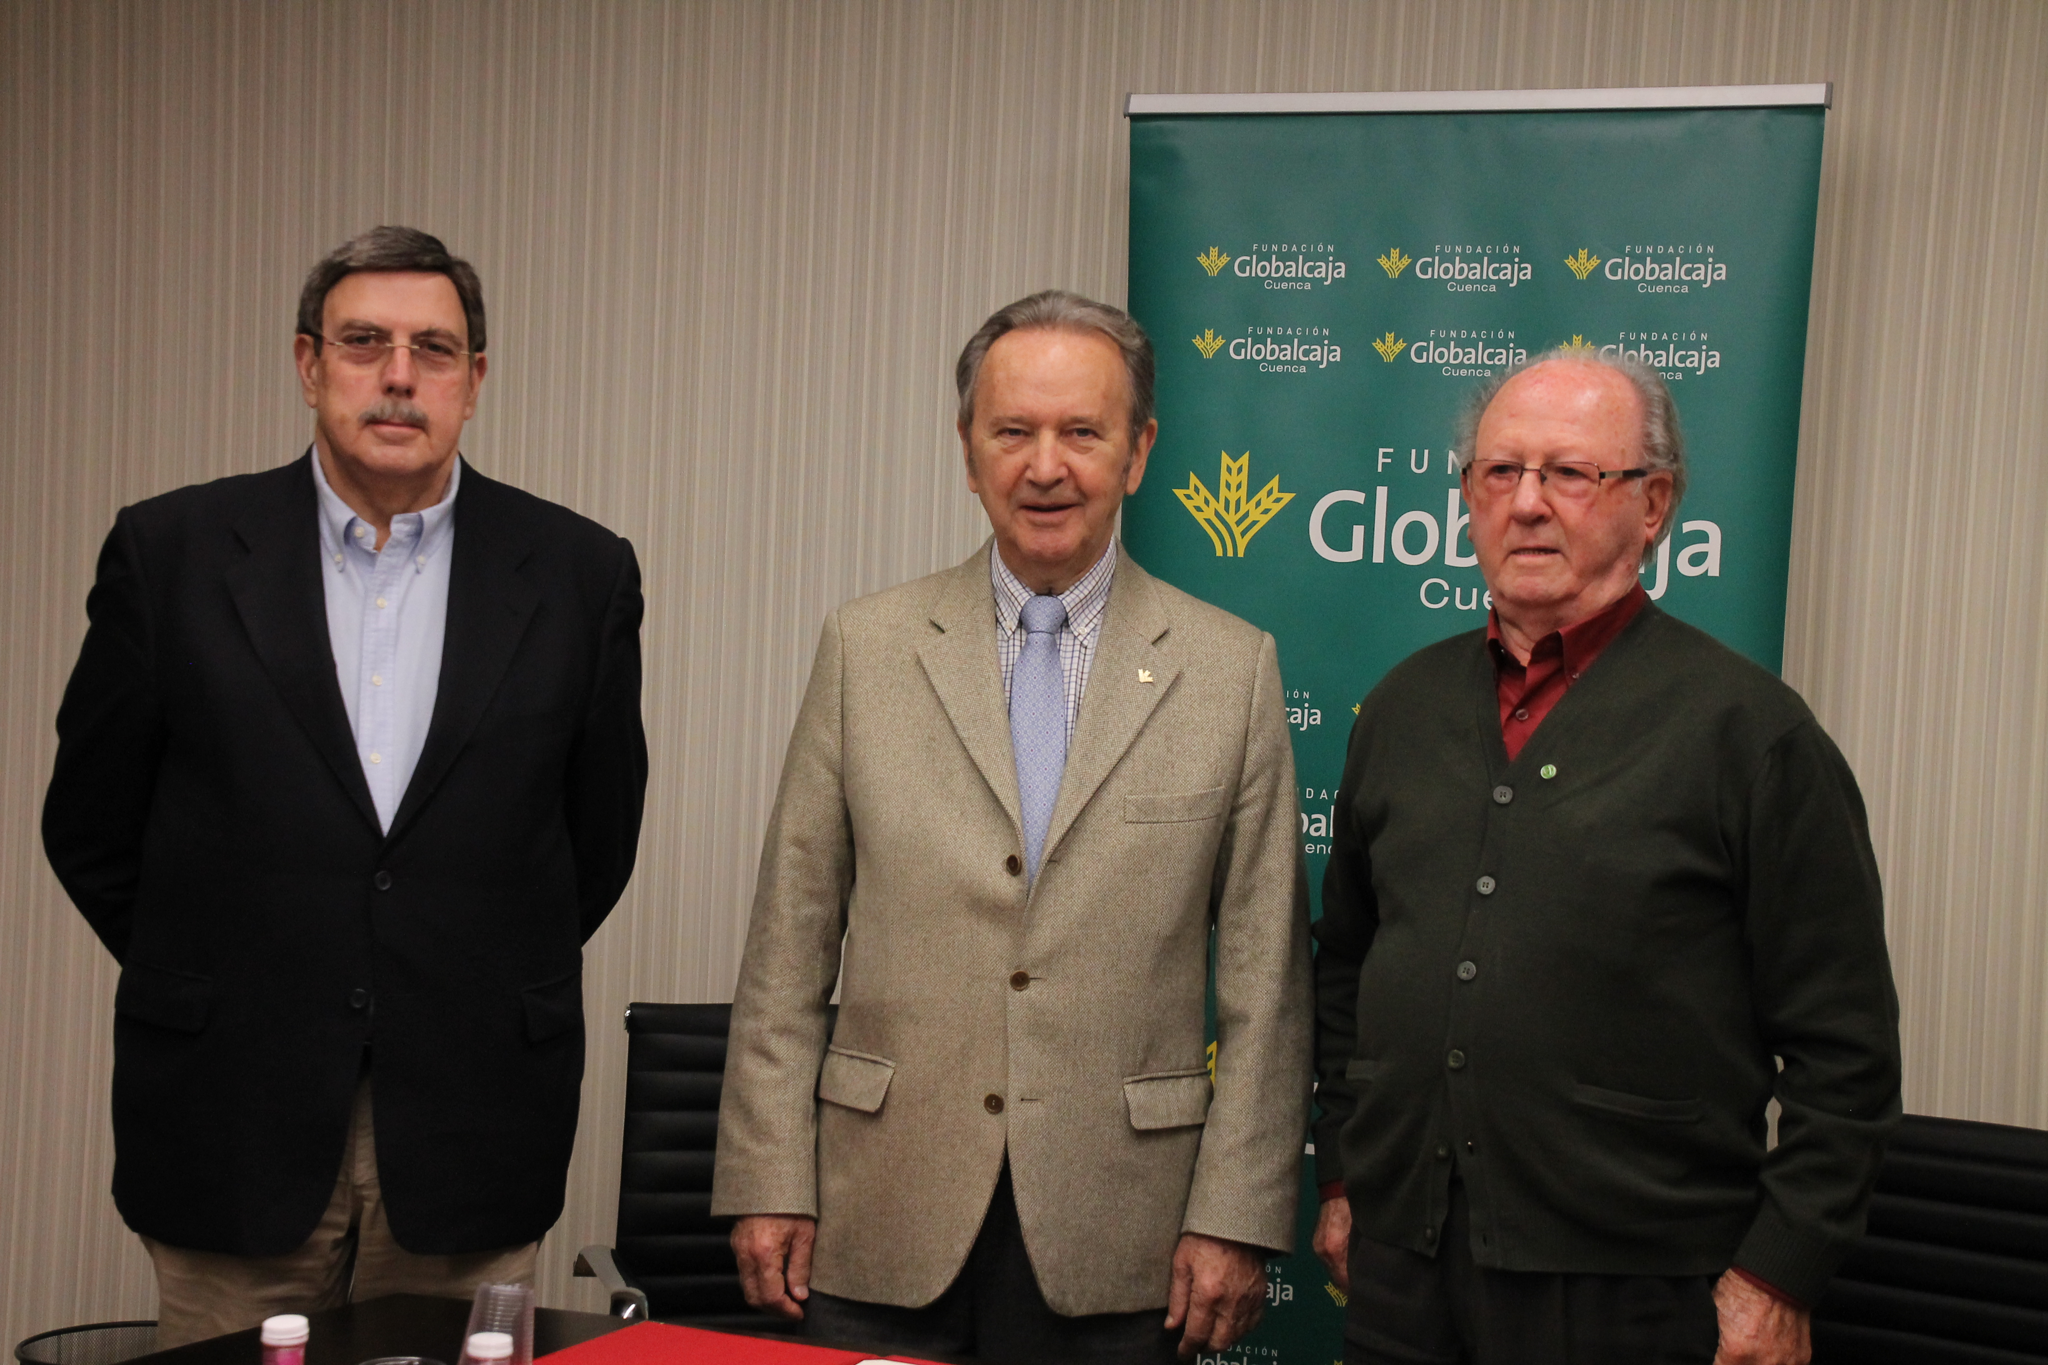 https://blog.globalcaja.es/wp-content/uploads/2016/01/FIRMA-CONVENIO_San-Vicente-Paul-12.jpg